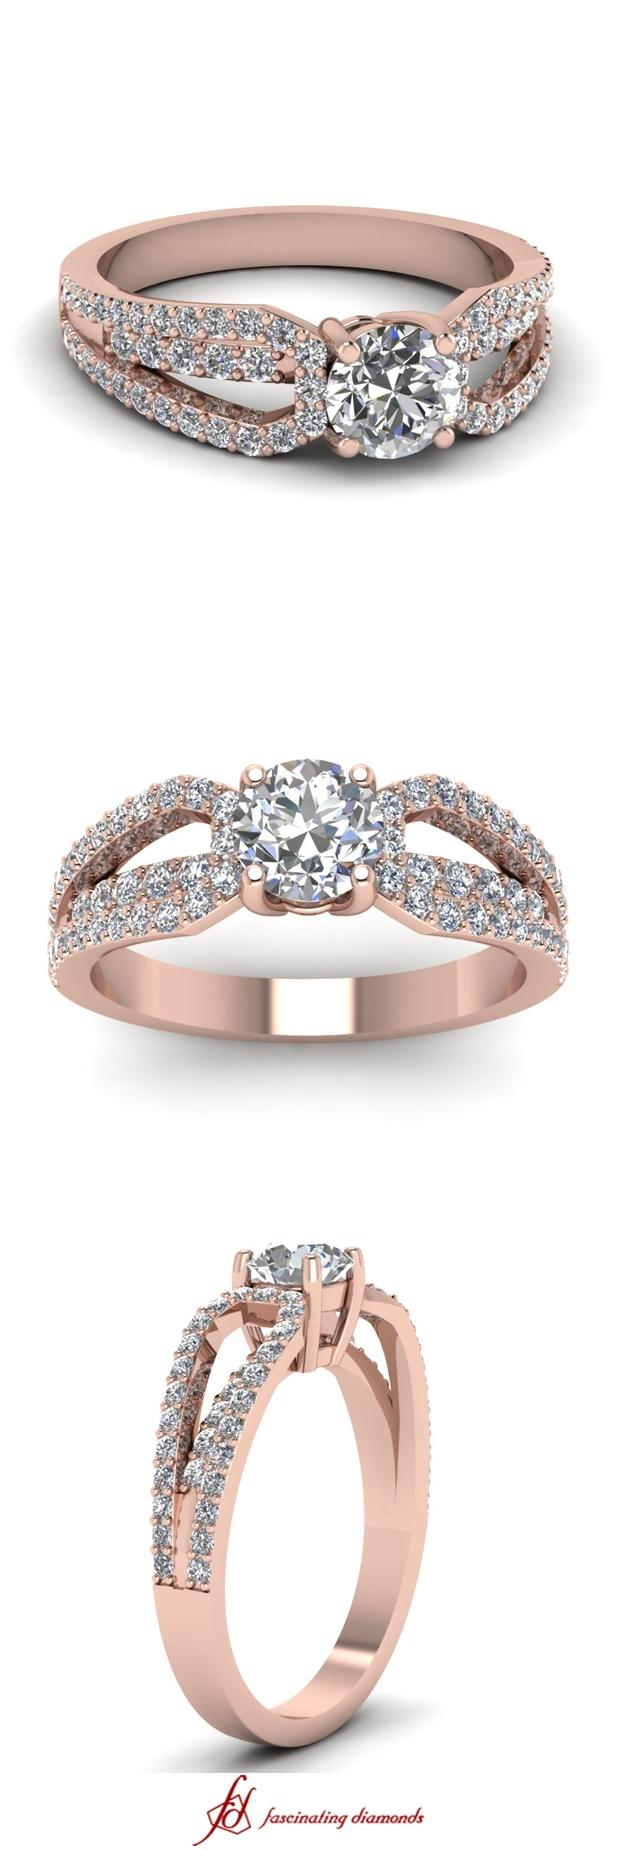 Split Loop Ring    Round Cut Diamond Side Stone Ring With White Diamond In 14K Rose Gold